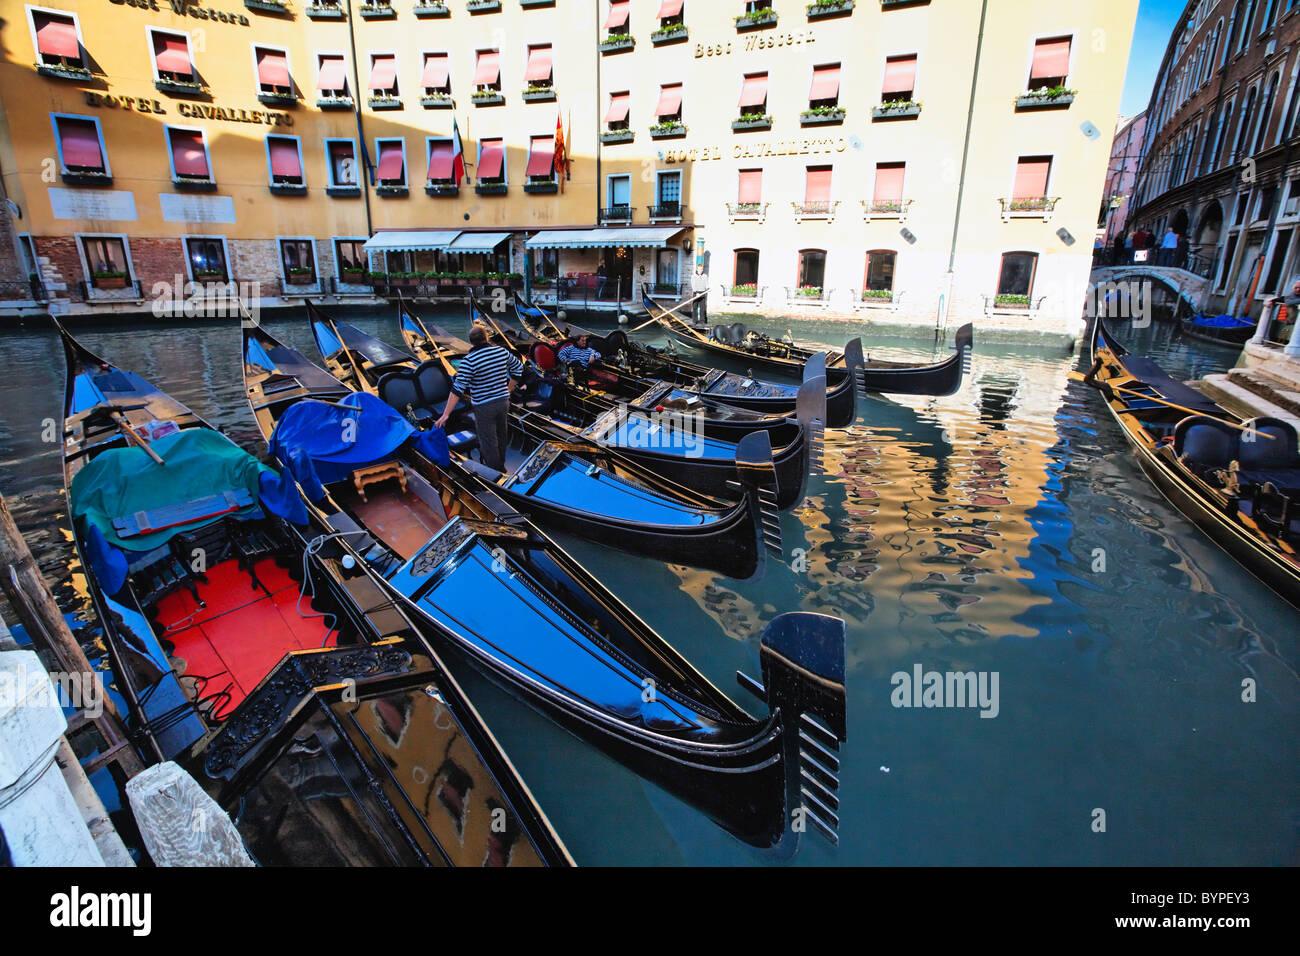 Gondolas in Orseolo Basin at Hotel Cavalletto, Venice, Veneto, Italy - Stock Image